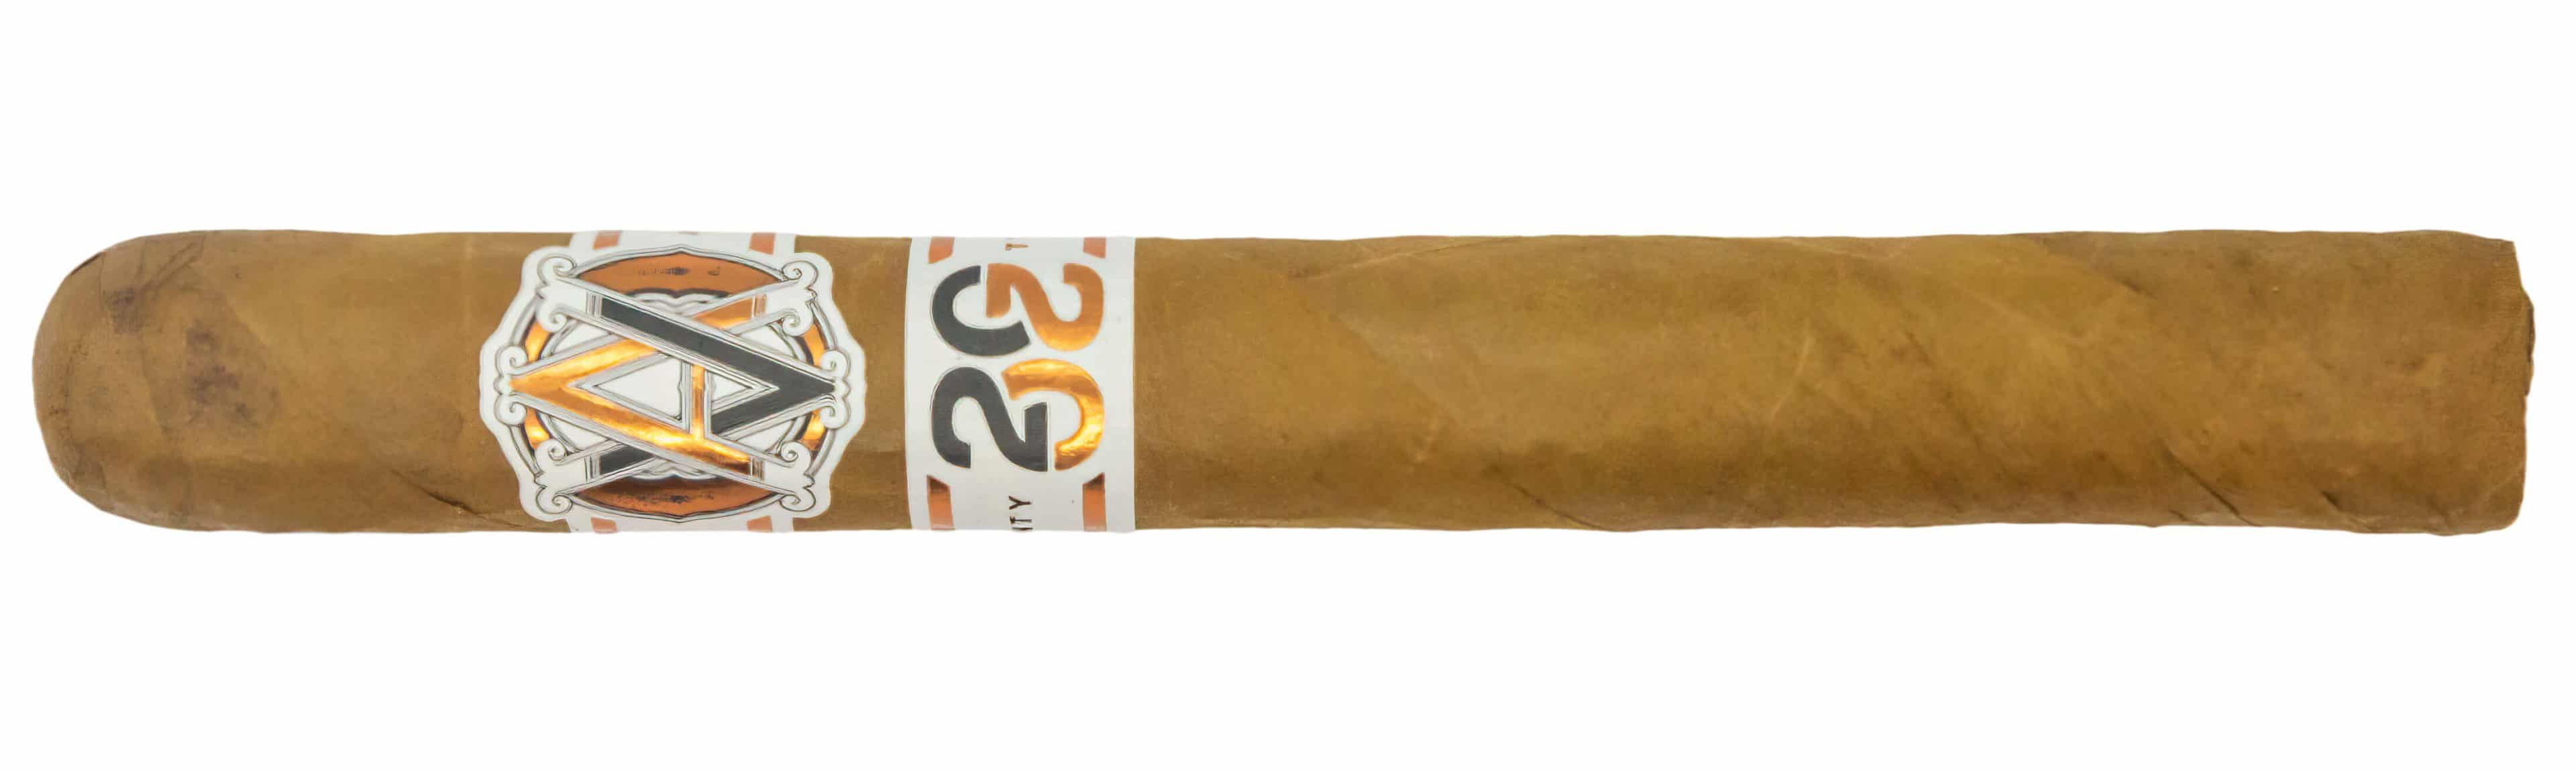 Blind Cigar Review: AVO   Improvisation LE20